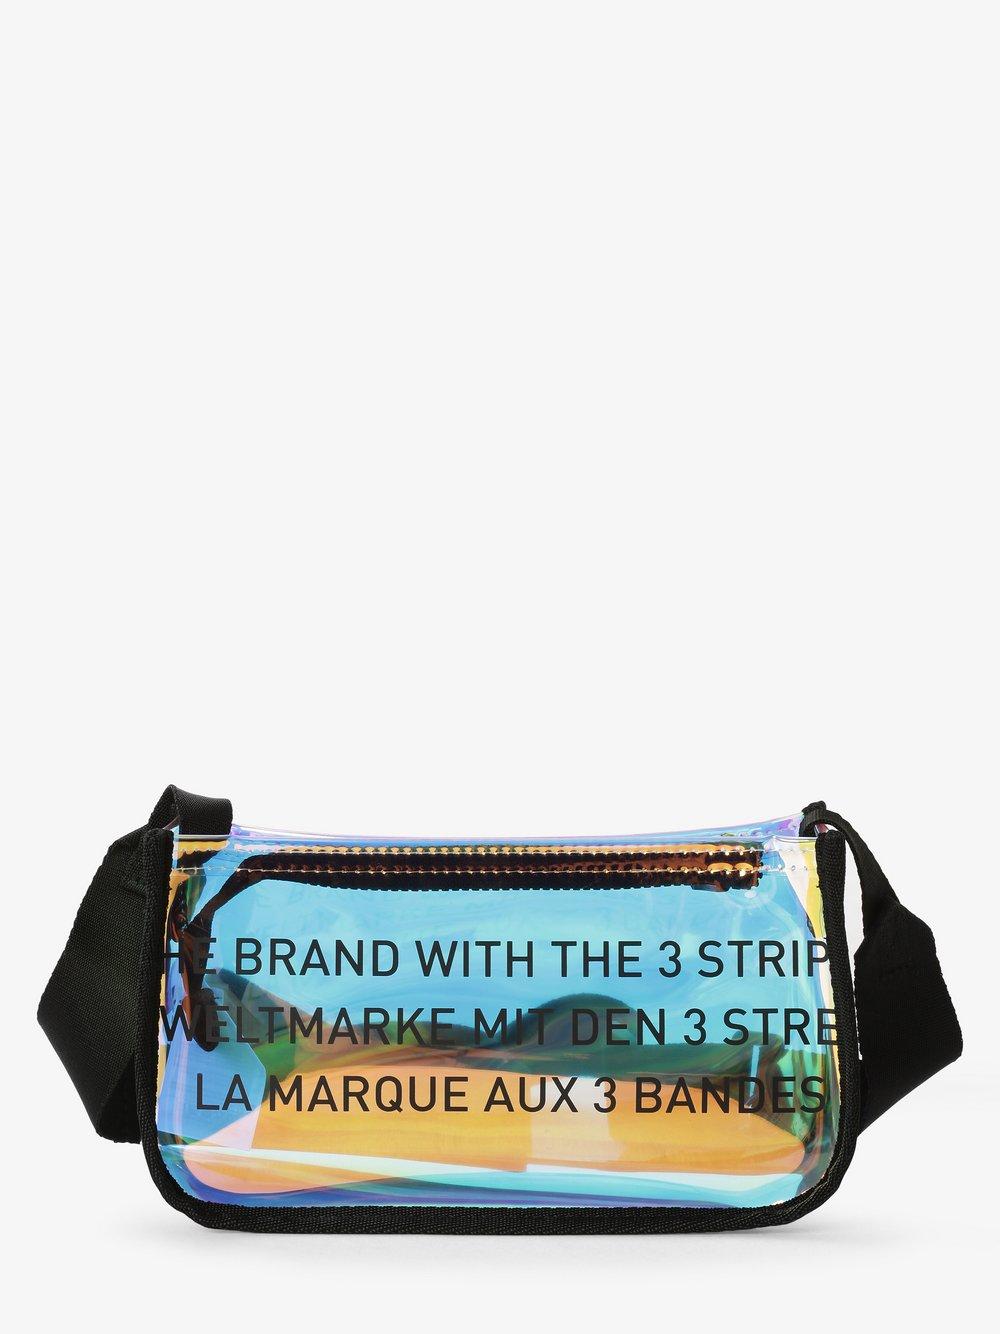 adidas Originals - Damska torebka na ramię, wielokolorowy